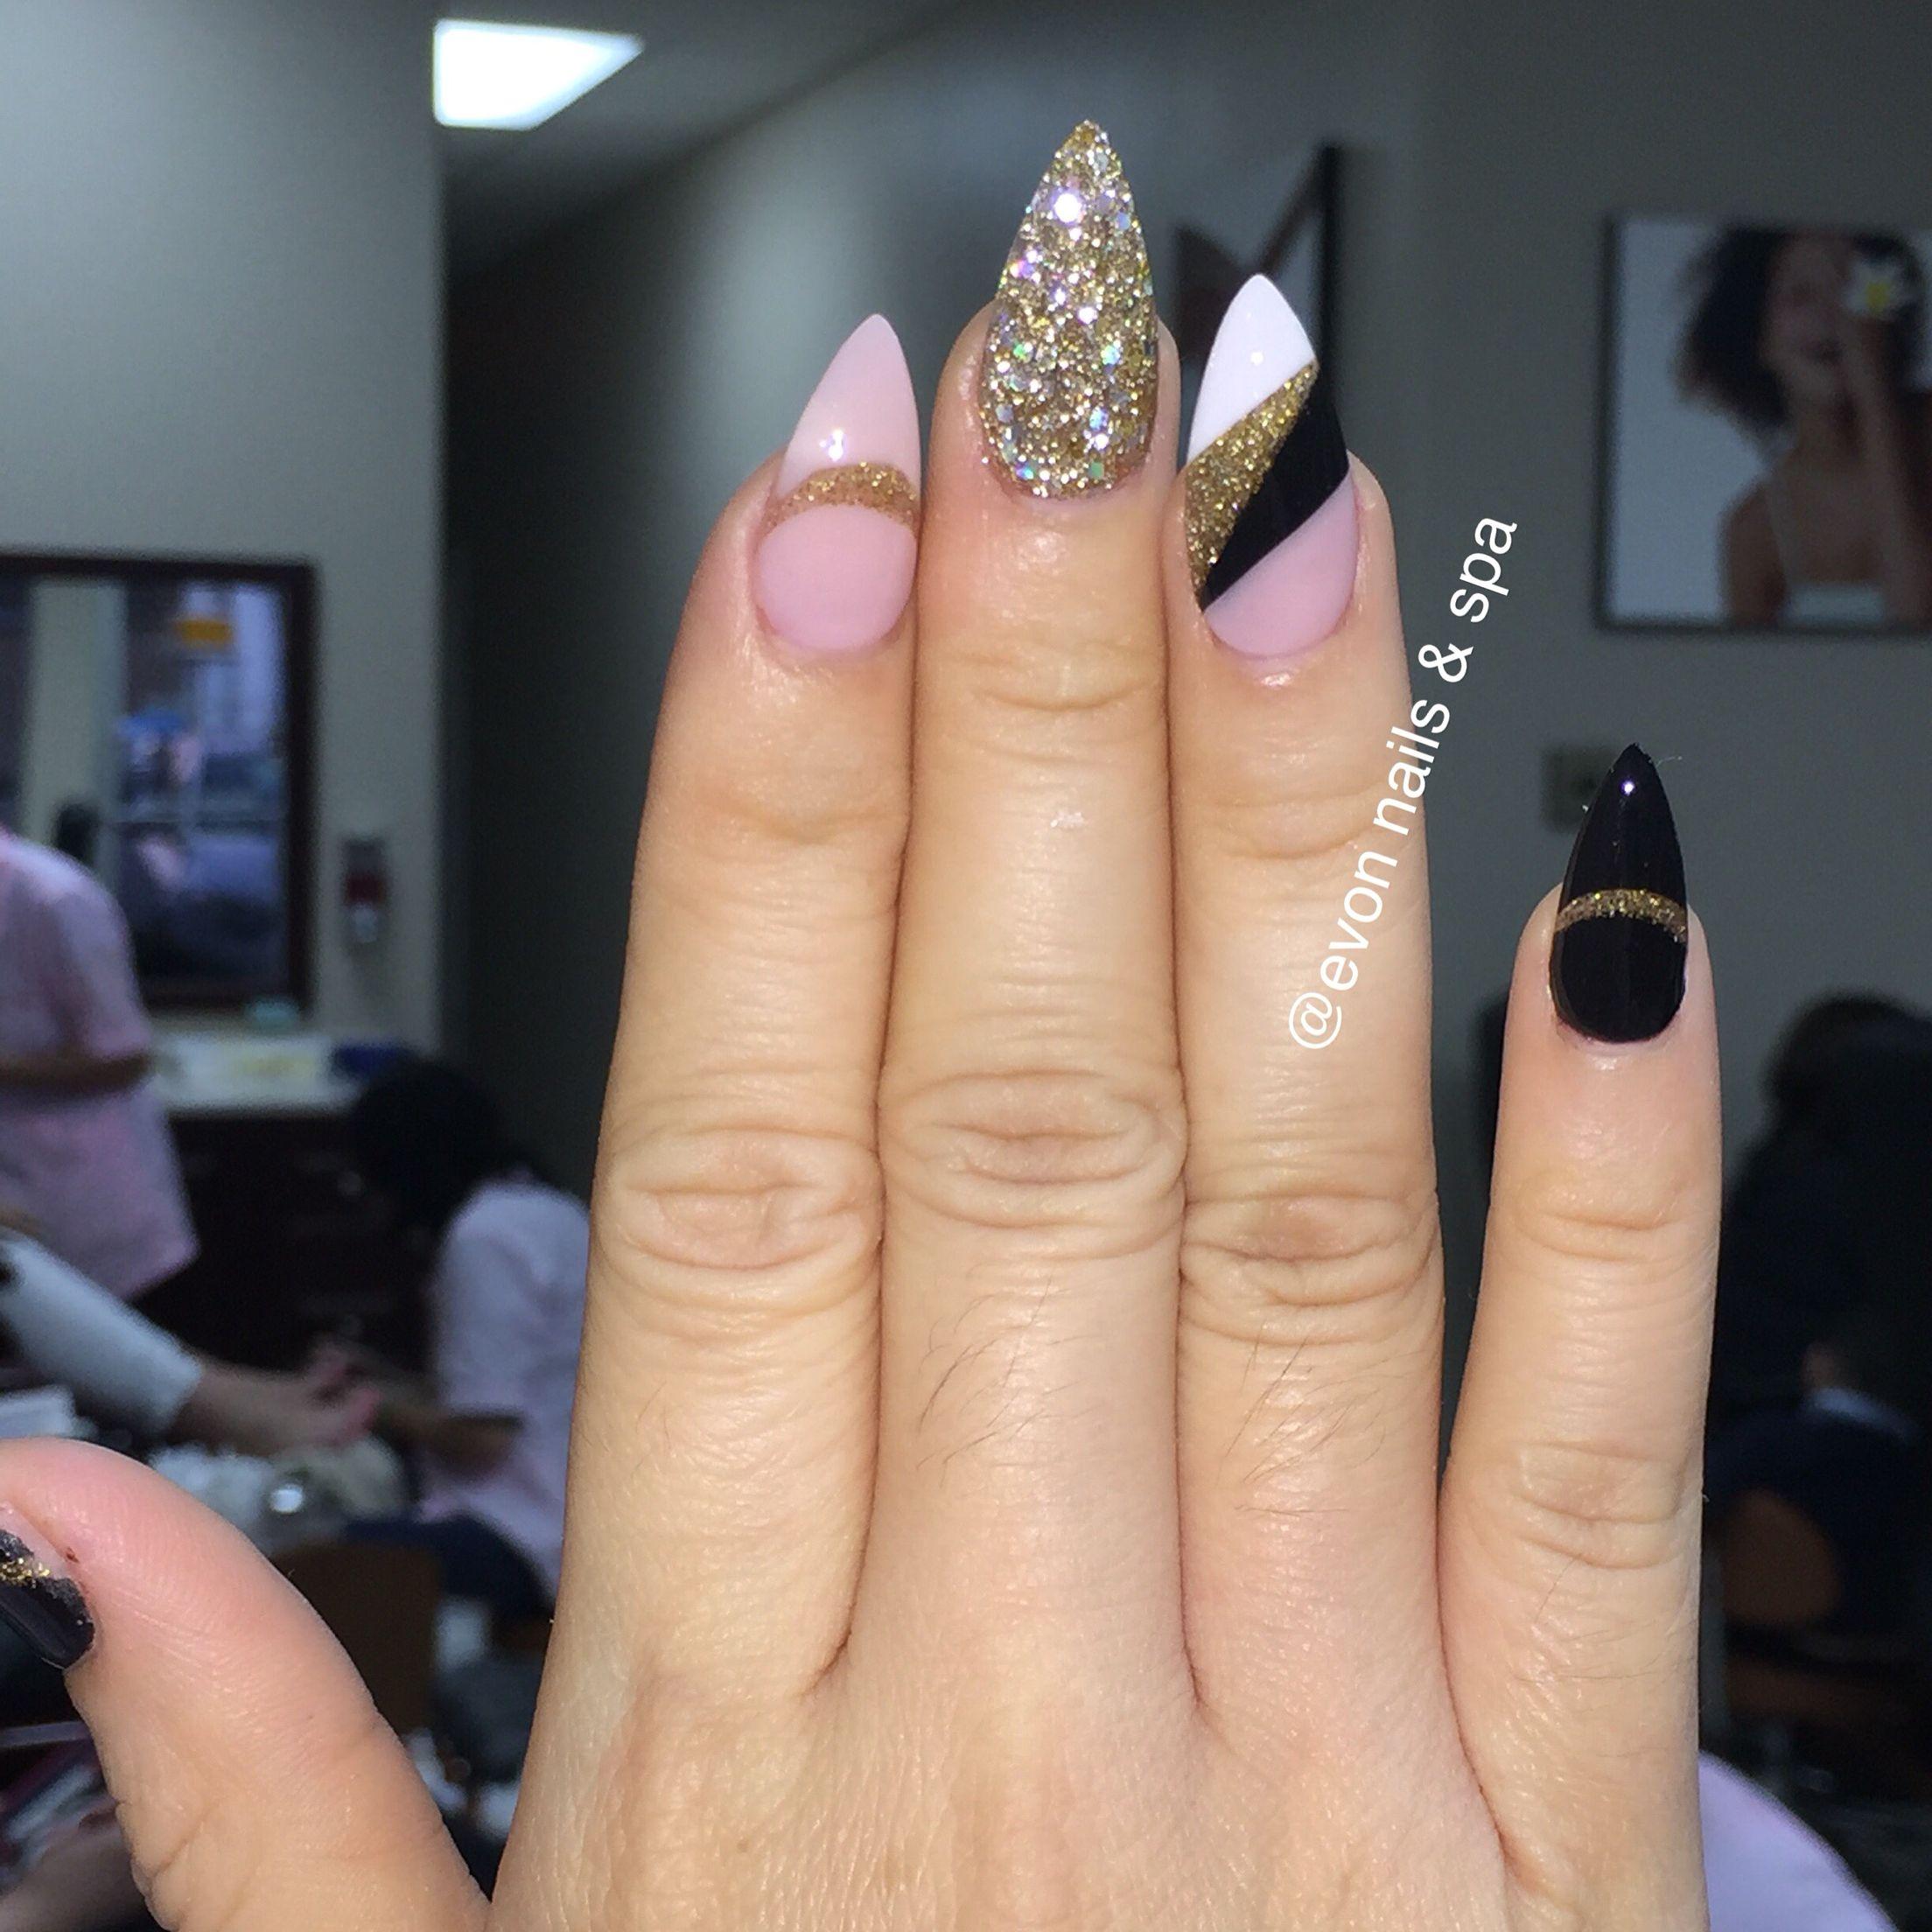 Nails by Kathy - Evon -Tina- Vy -Cindy- Emi -Lisa #evonnailsspa ...